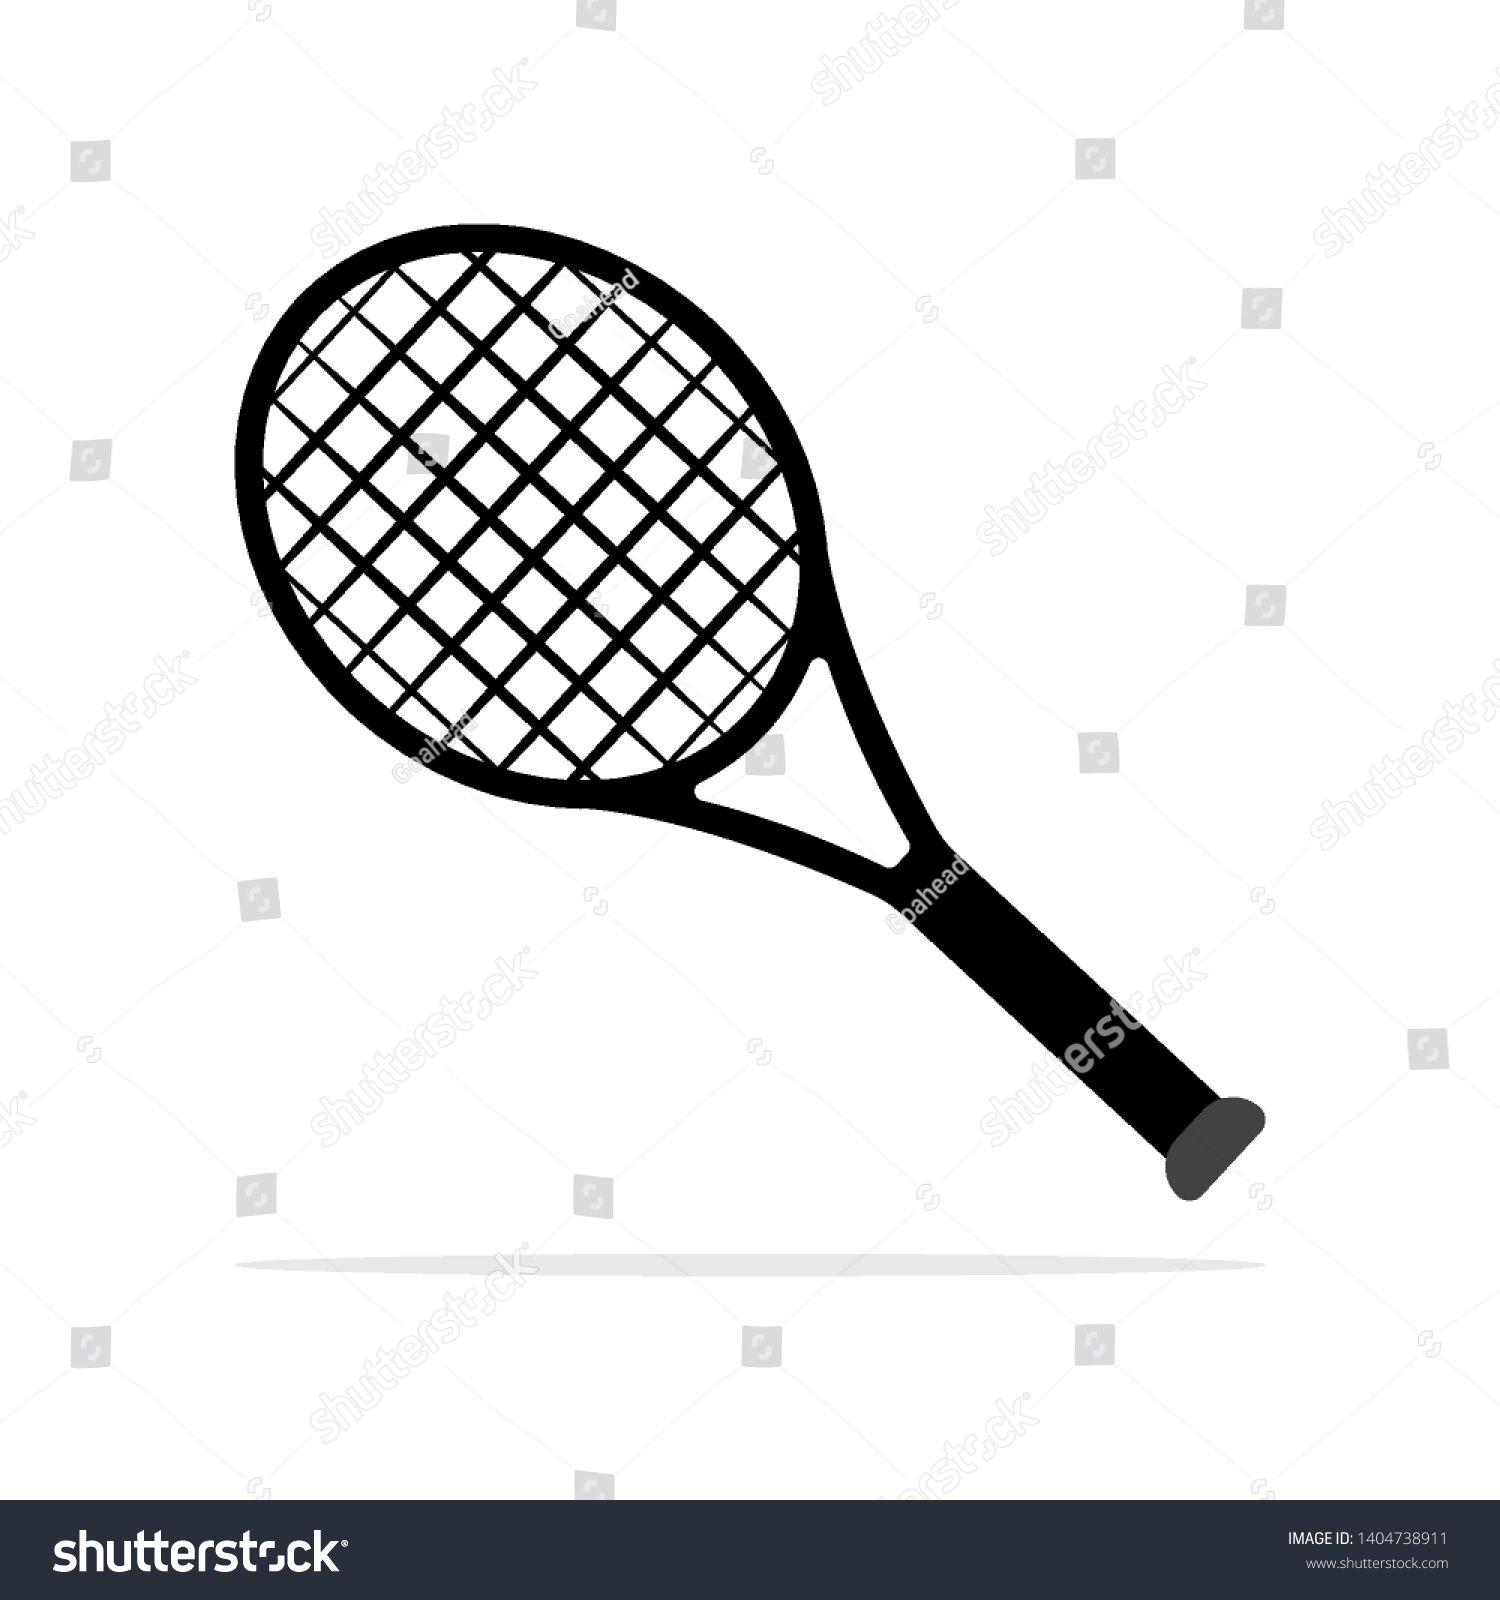 Tennis Racket Icon Vector Concept Illustration For Design Ad Sponsored Icon Racket Tennis Vector Graphic Arts Tutorials Tennis Illustration